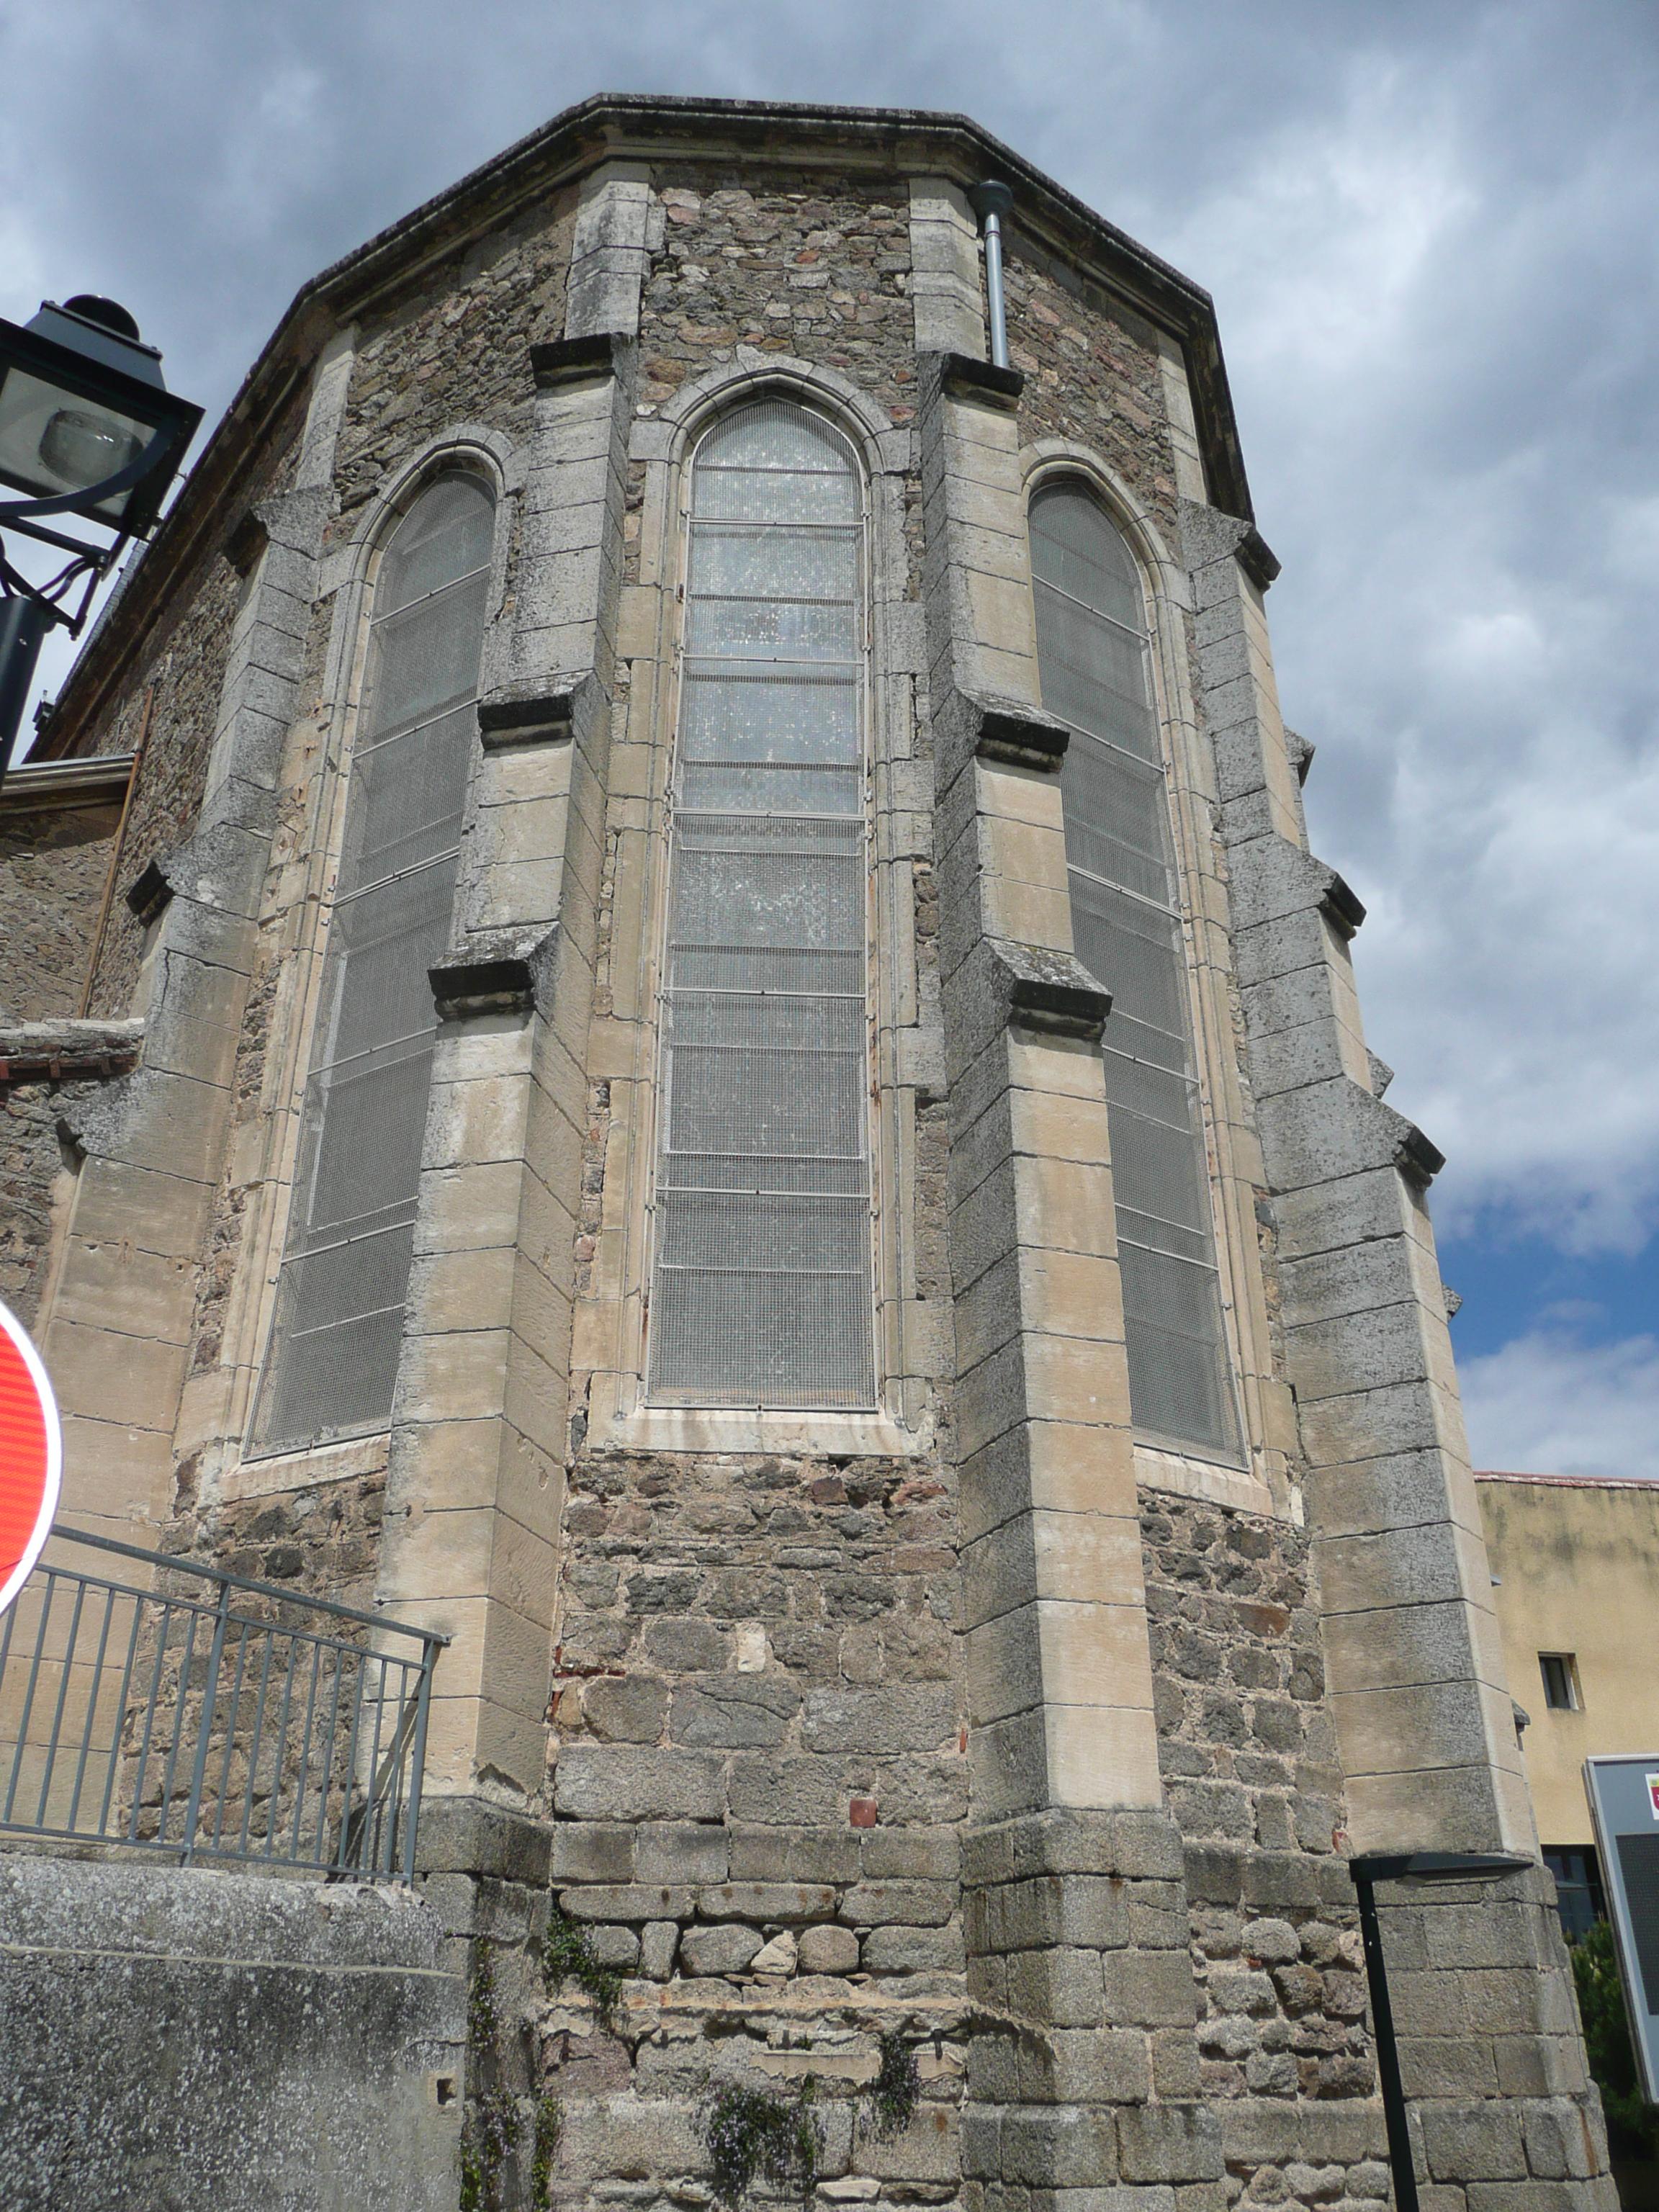 ÉGLISE SAINT ROMAIN EN LYONNAIS À RONTALON